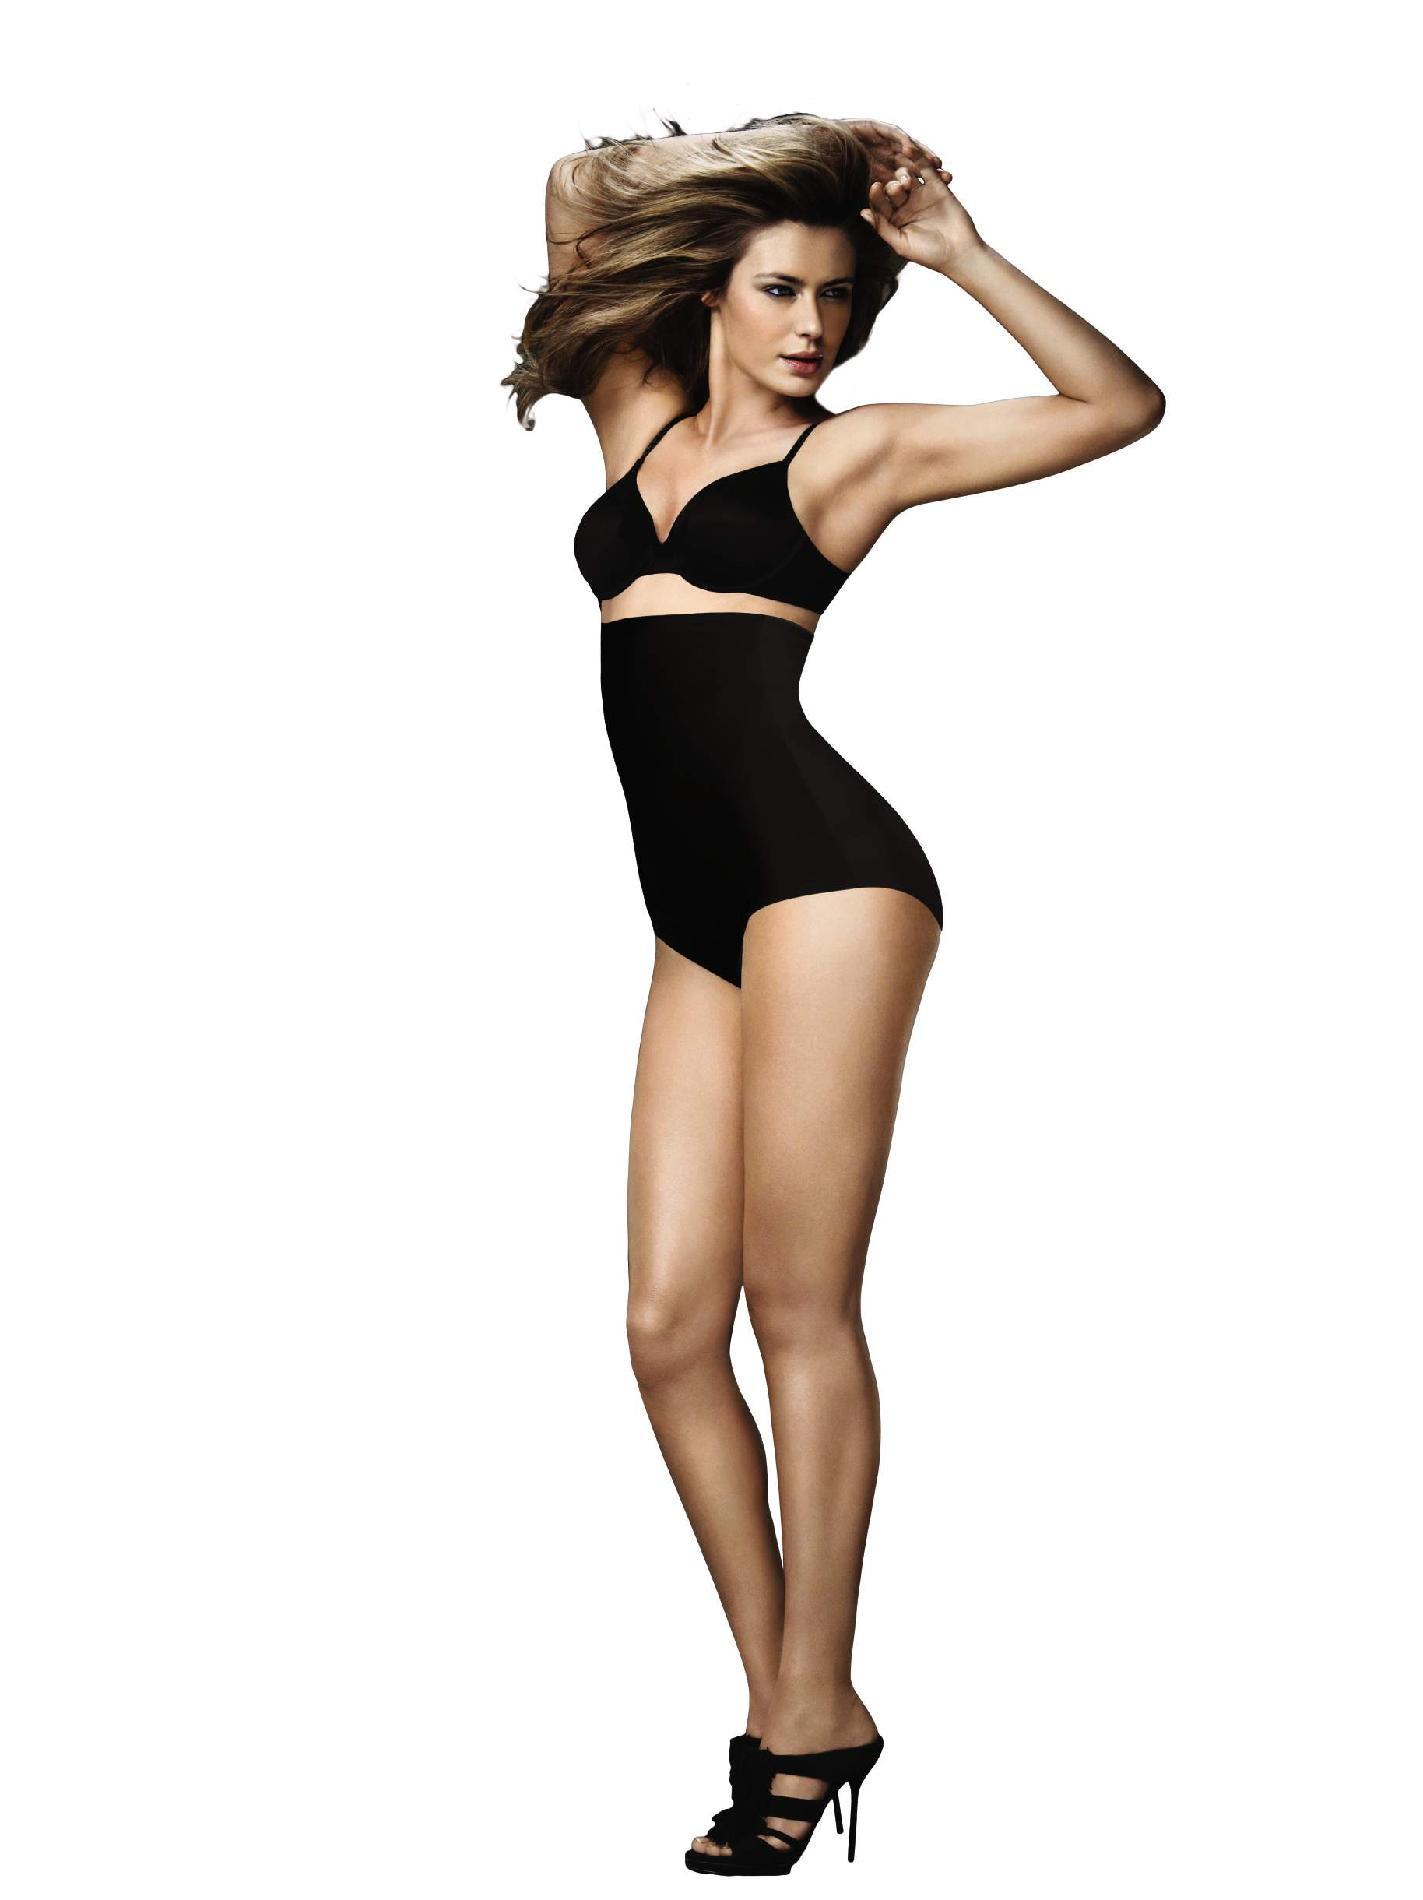 Maidenform Women's High Waist Boy Short Body Shaper - 2059, Size: XXL